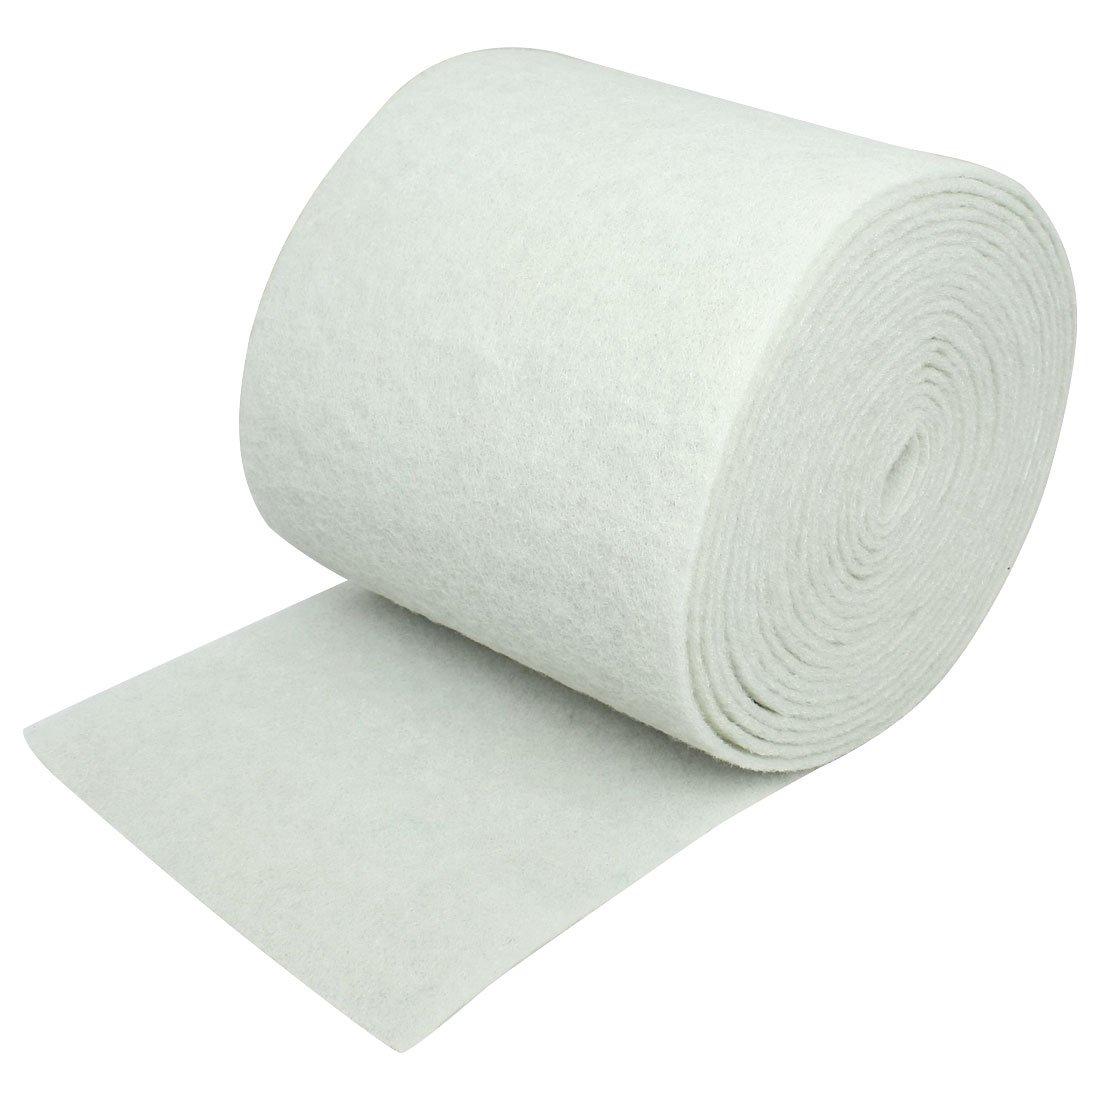 Uxcell Aquarium Tanks Biochemical Polyether Filter Sponge, 6-Feet, White